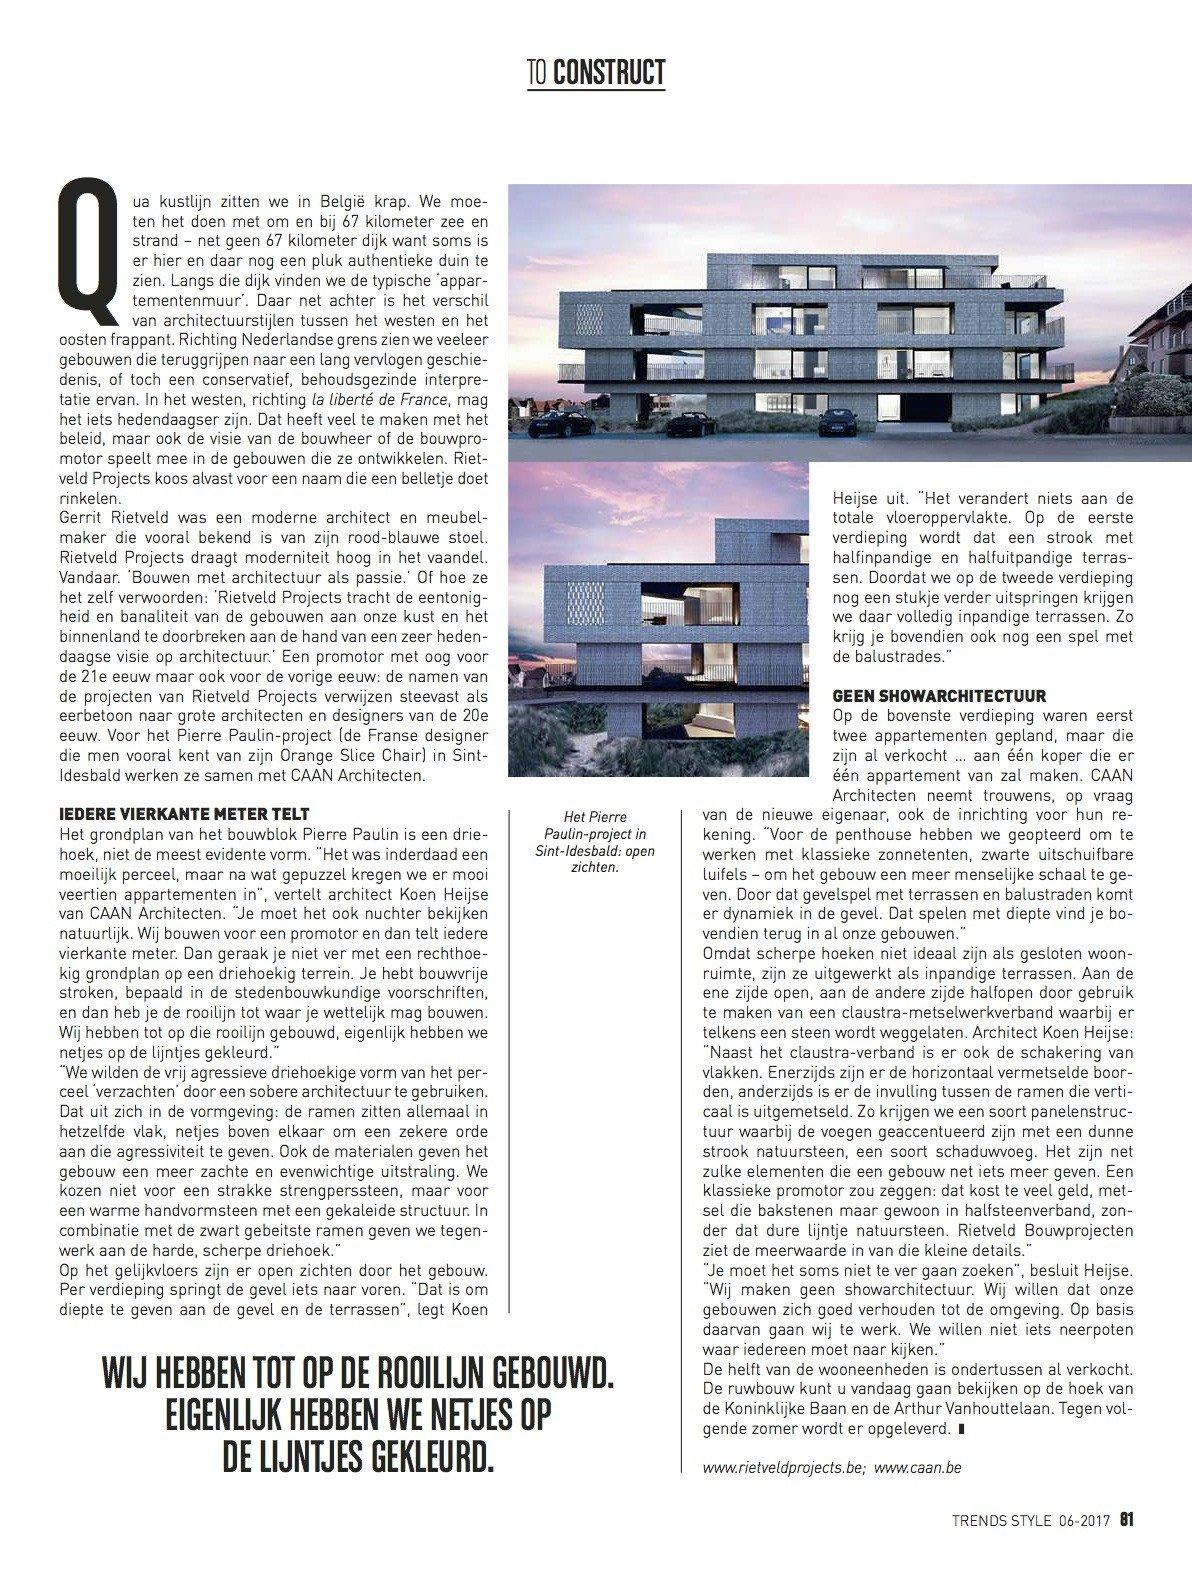 Trends Style 5-10-2017 - Rietveld Projects-Pierre Paulin 2